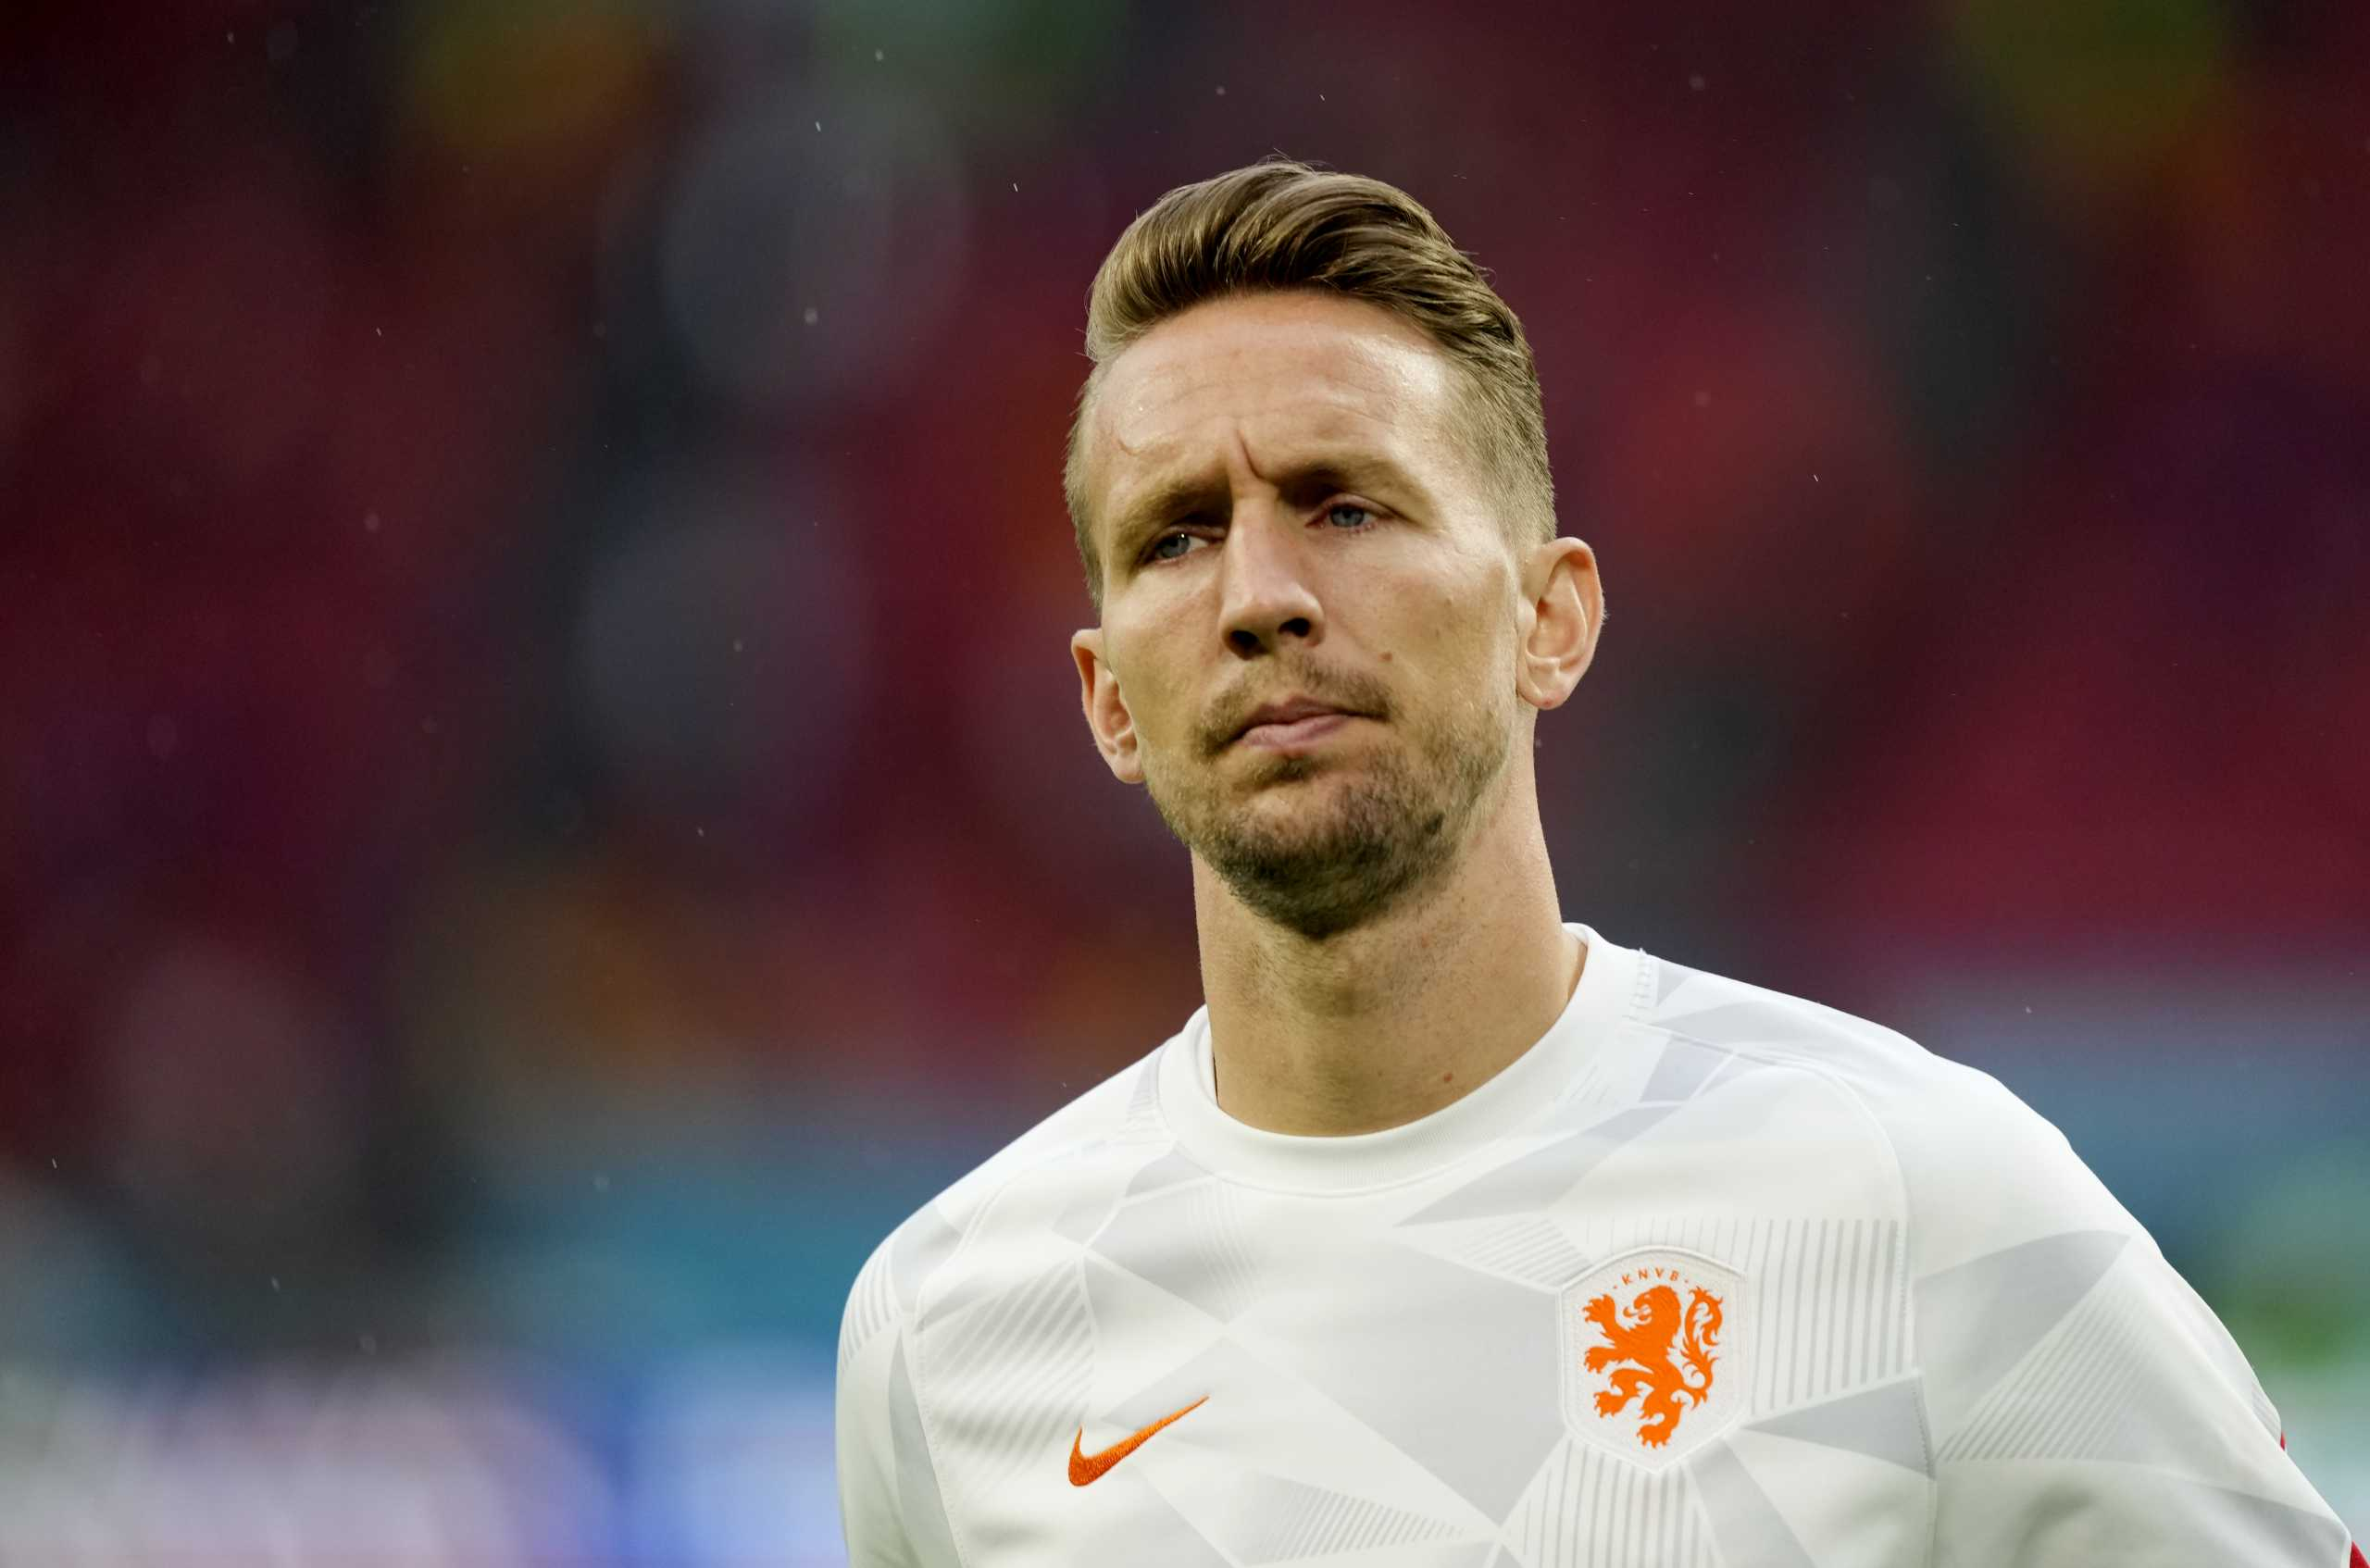 Euro 2020: Σοκ στην Ολλανδία με Ντε Γιονγκ που χάνει το υπόλοιπο της διοργάνωσης